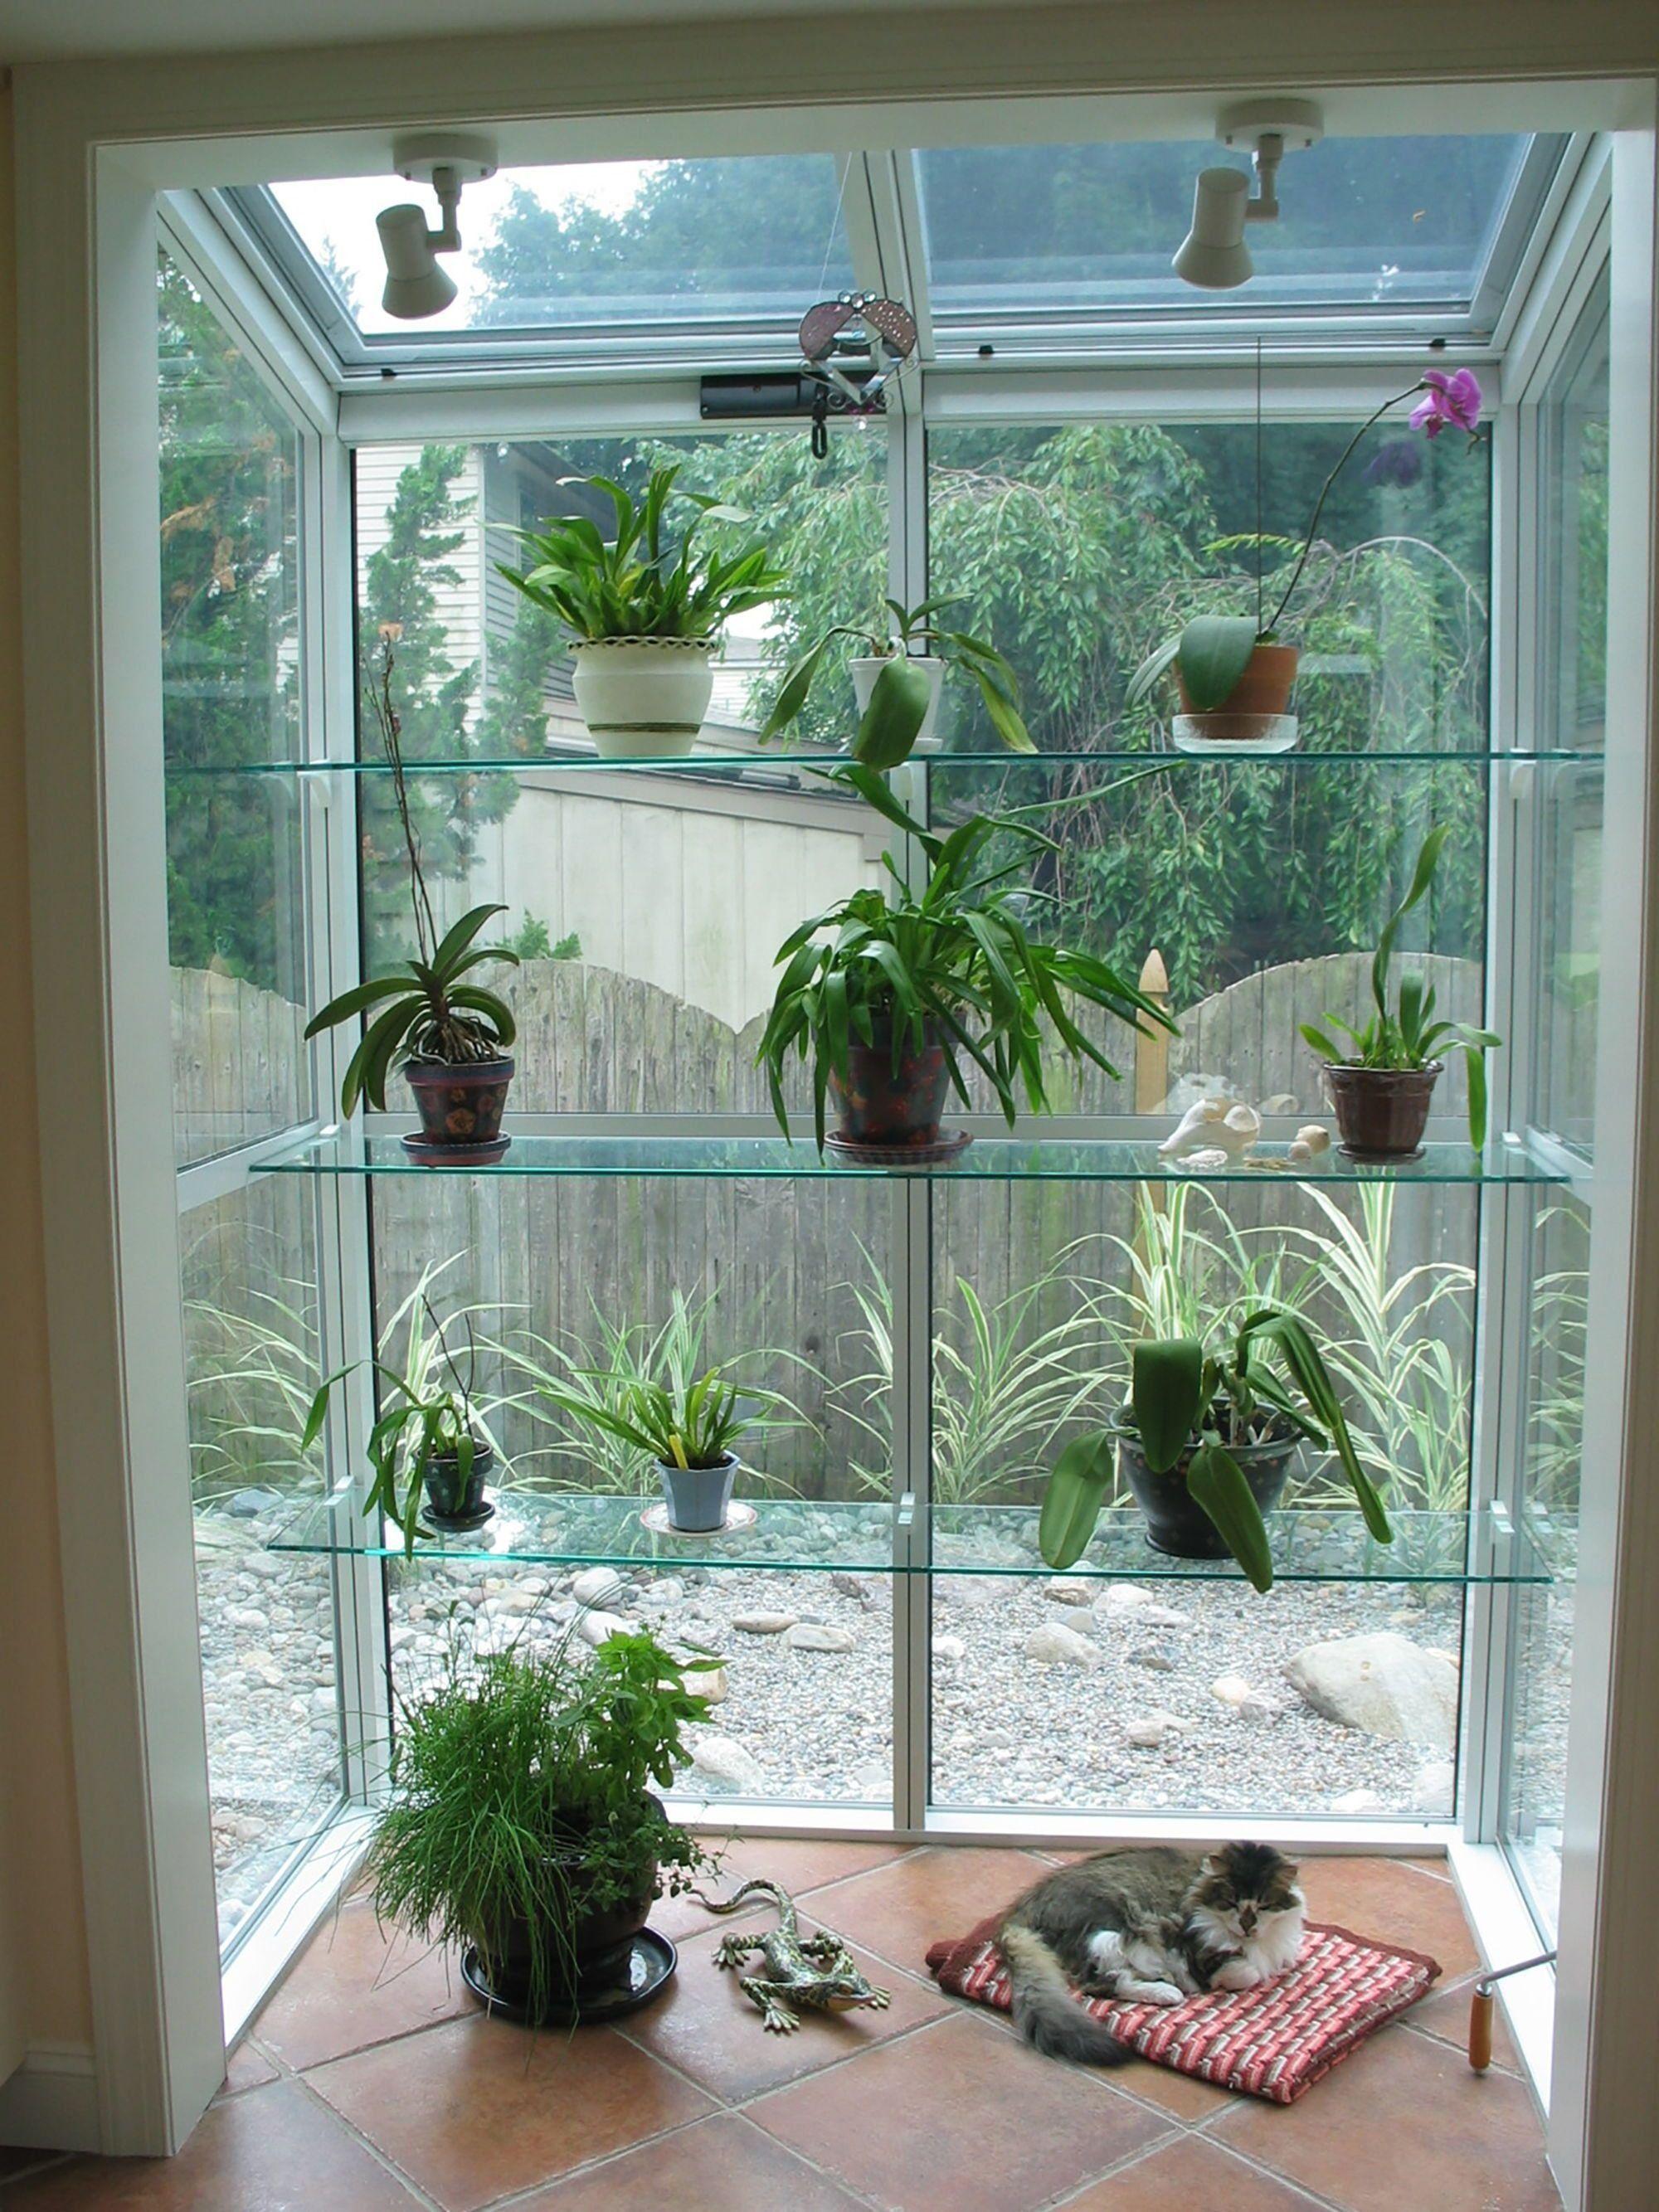 Easy greenhouse ideas greenhouseacademy 1000 in 2020